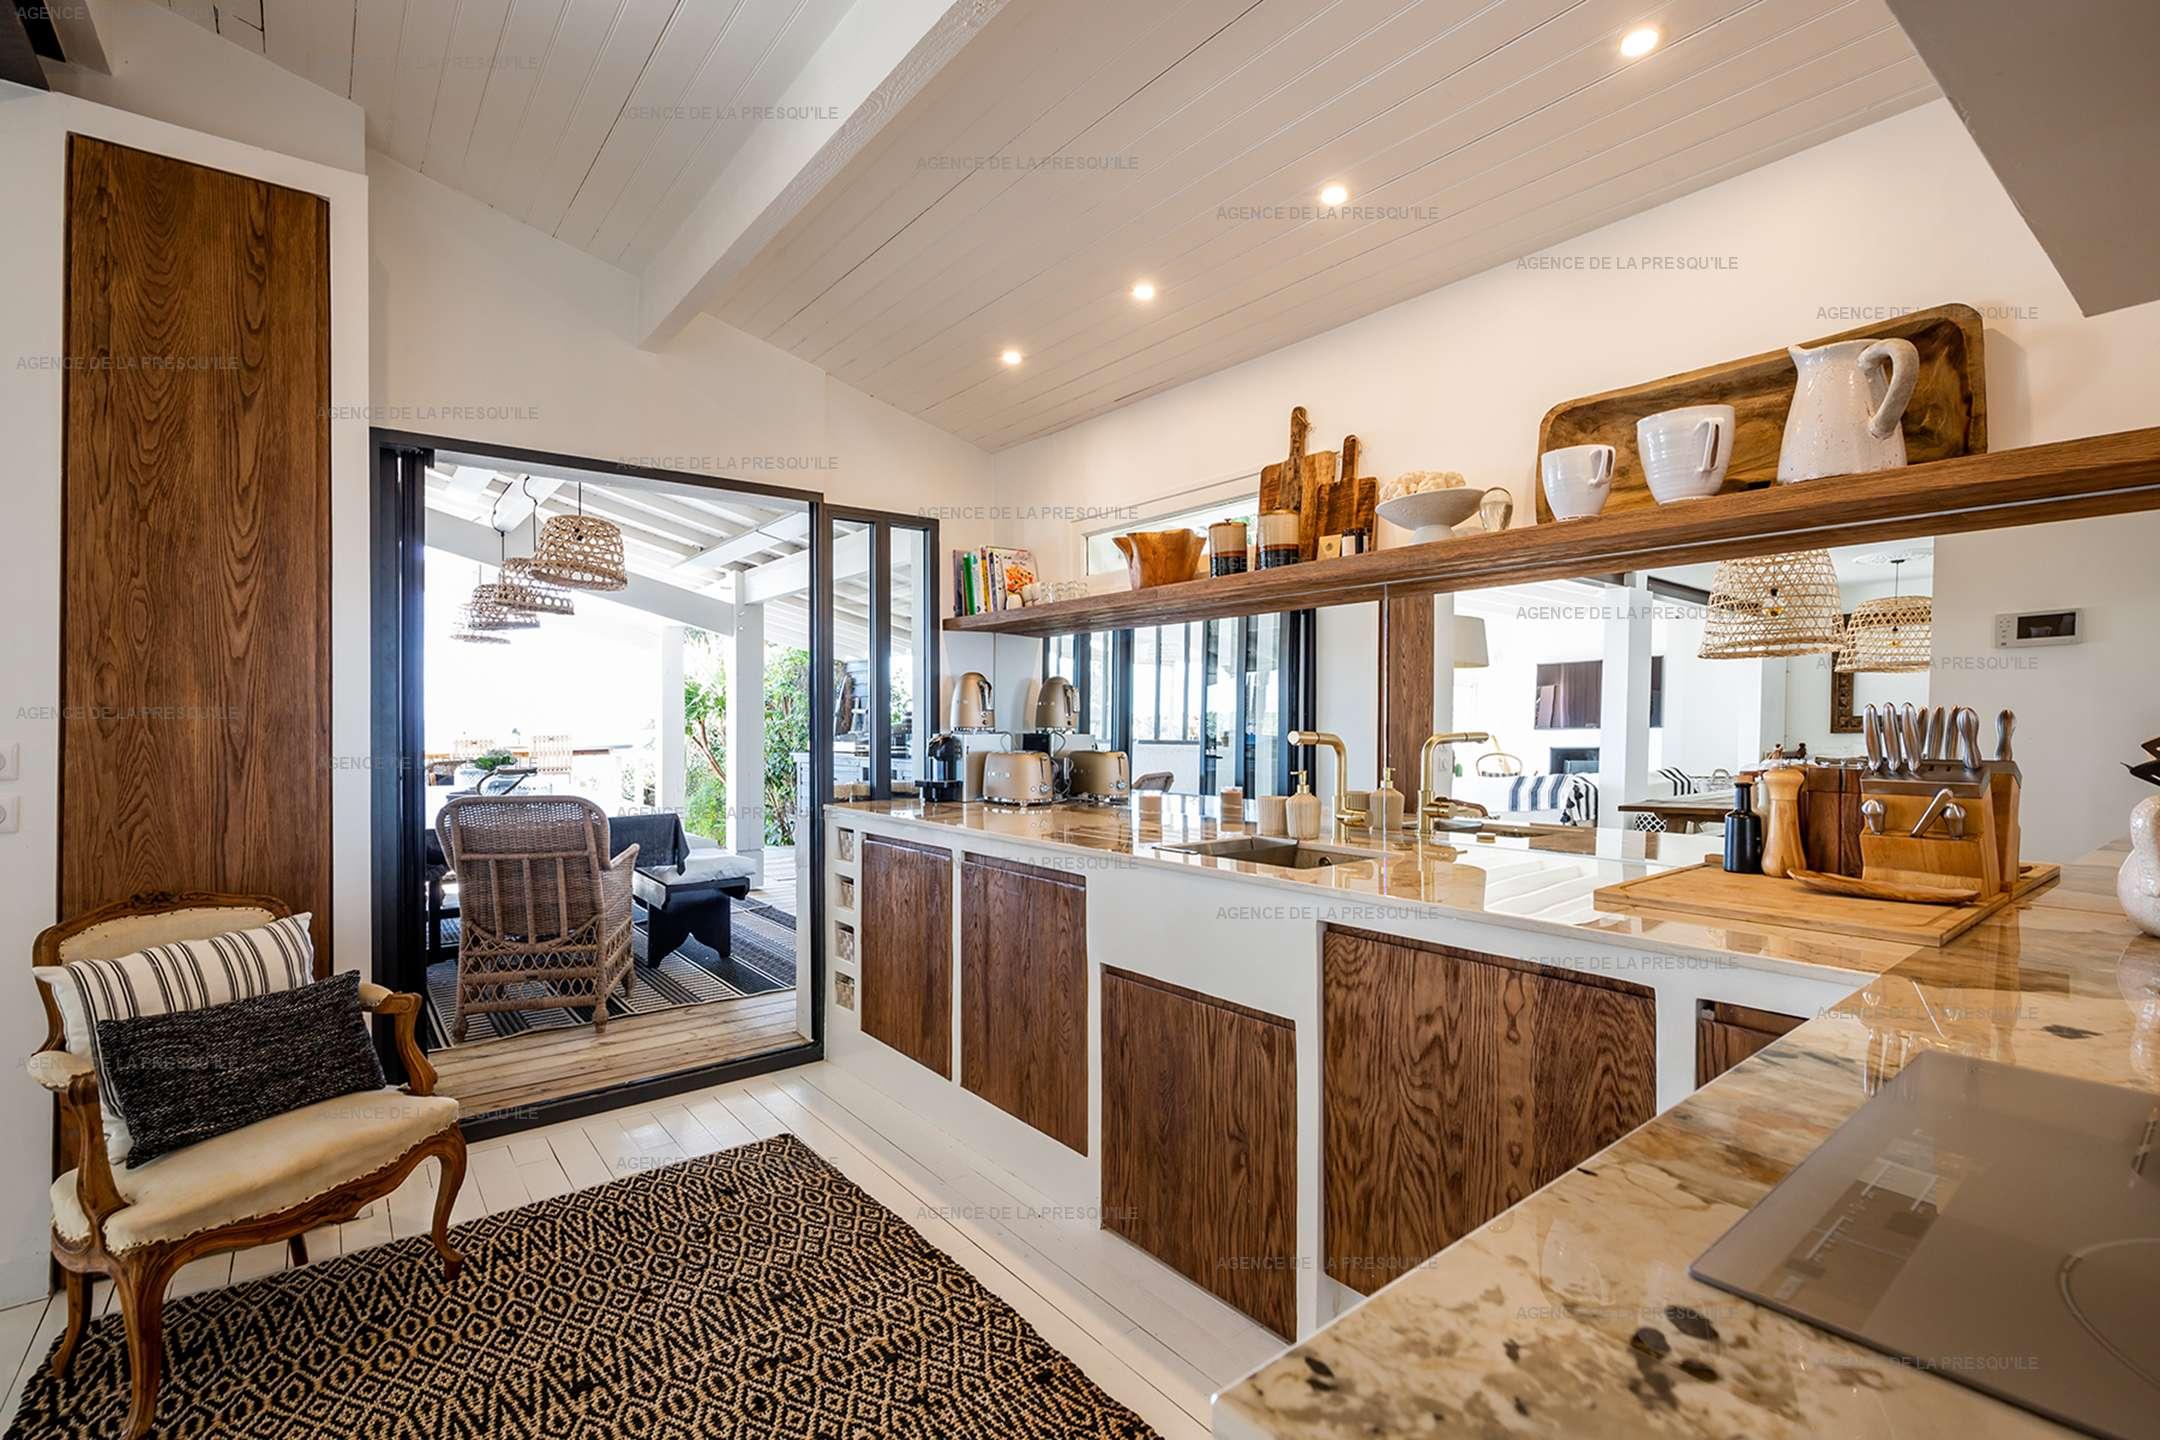 Location: Superbe villa avec vue bassin et piscine 8